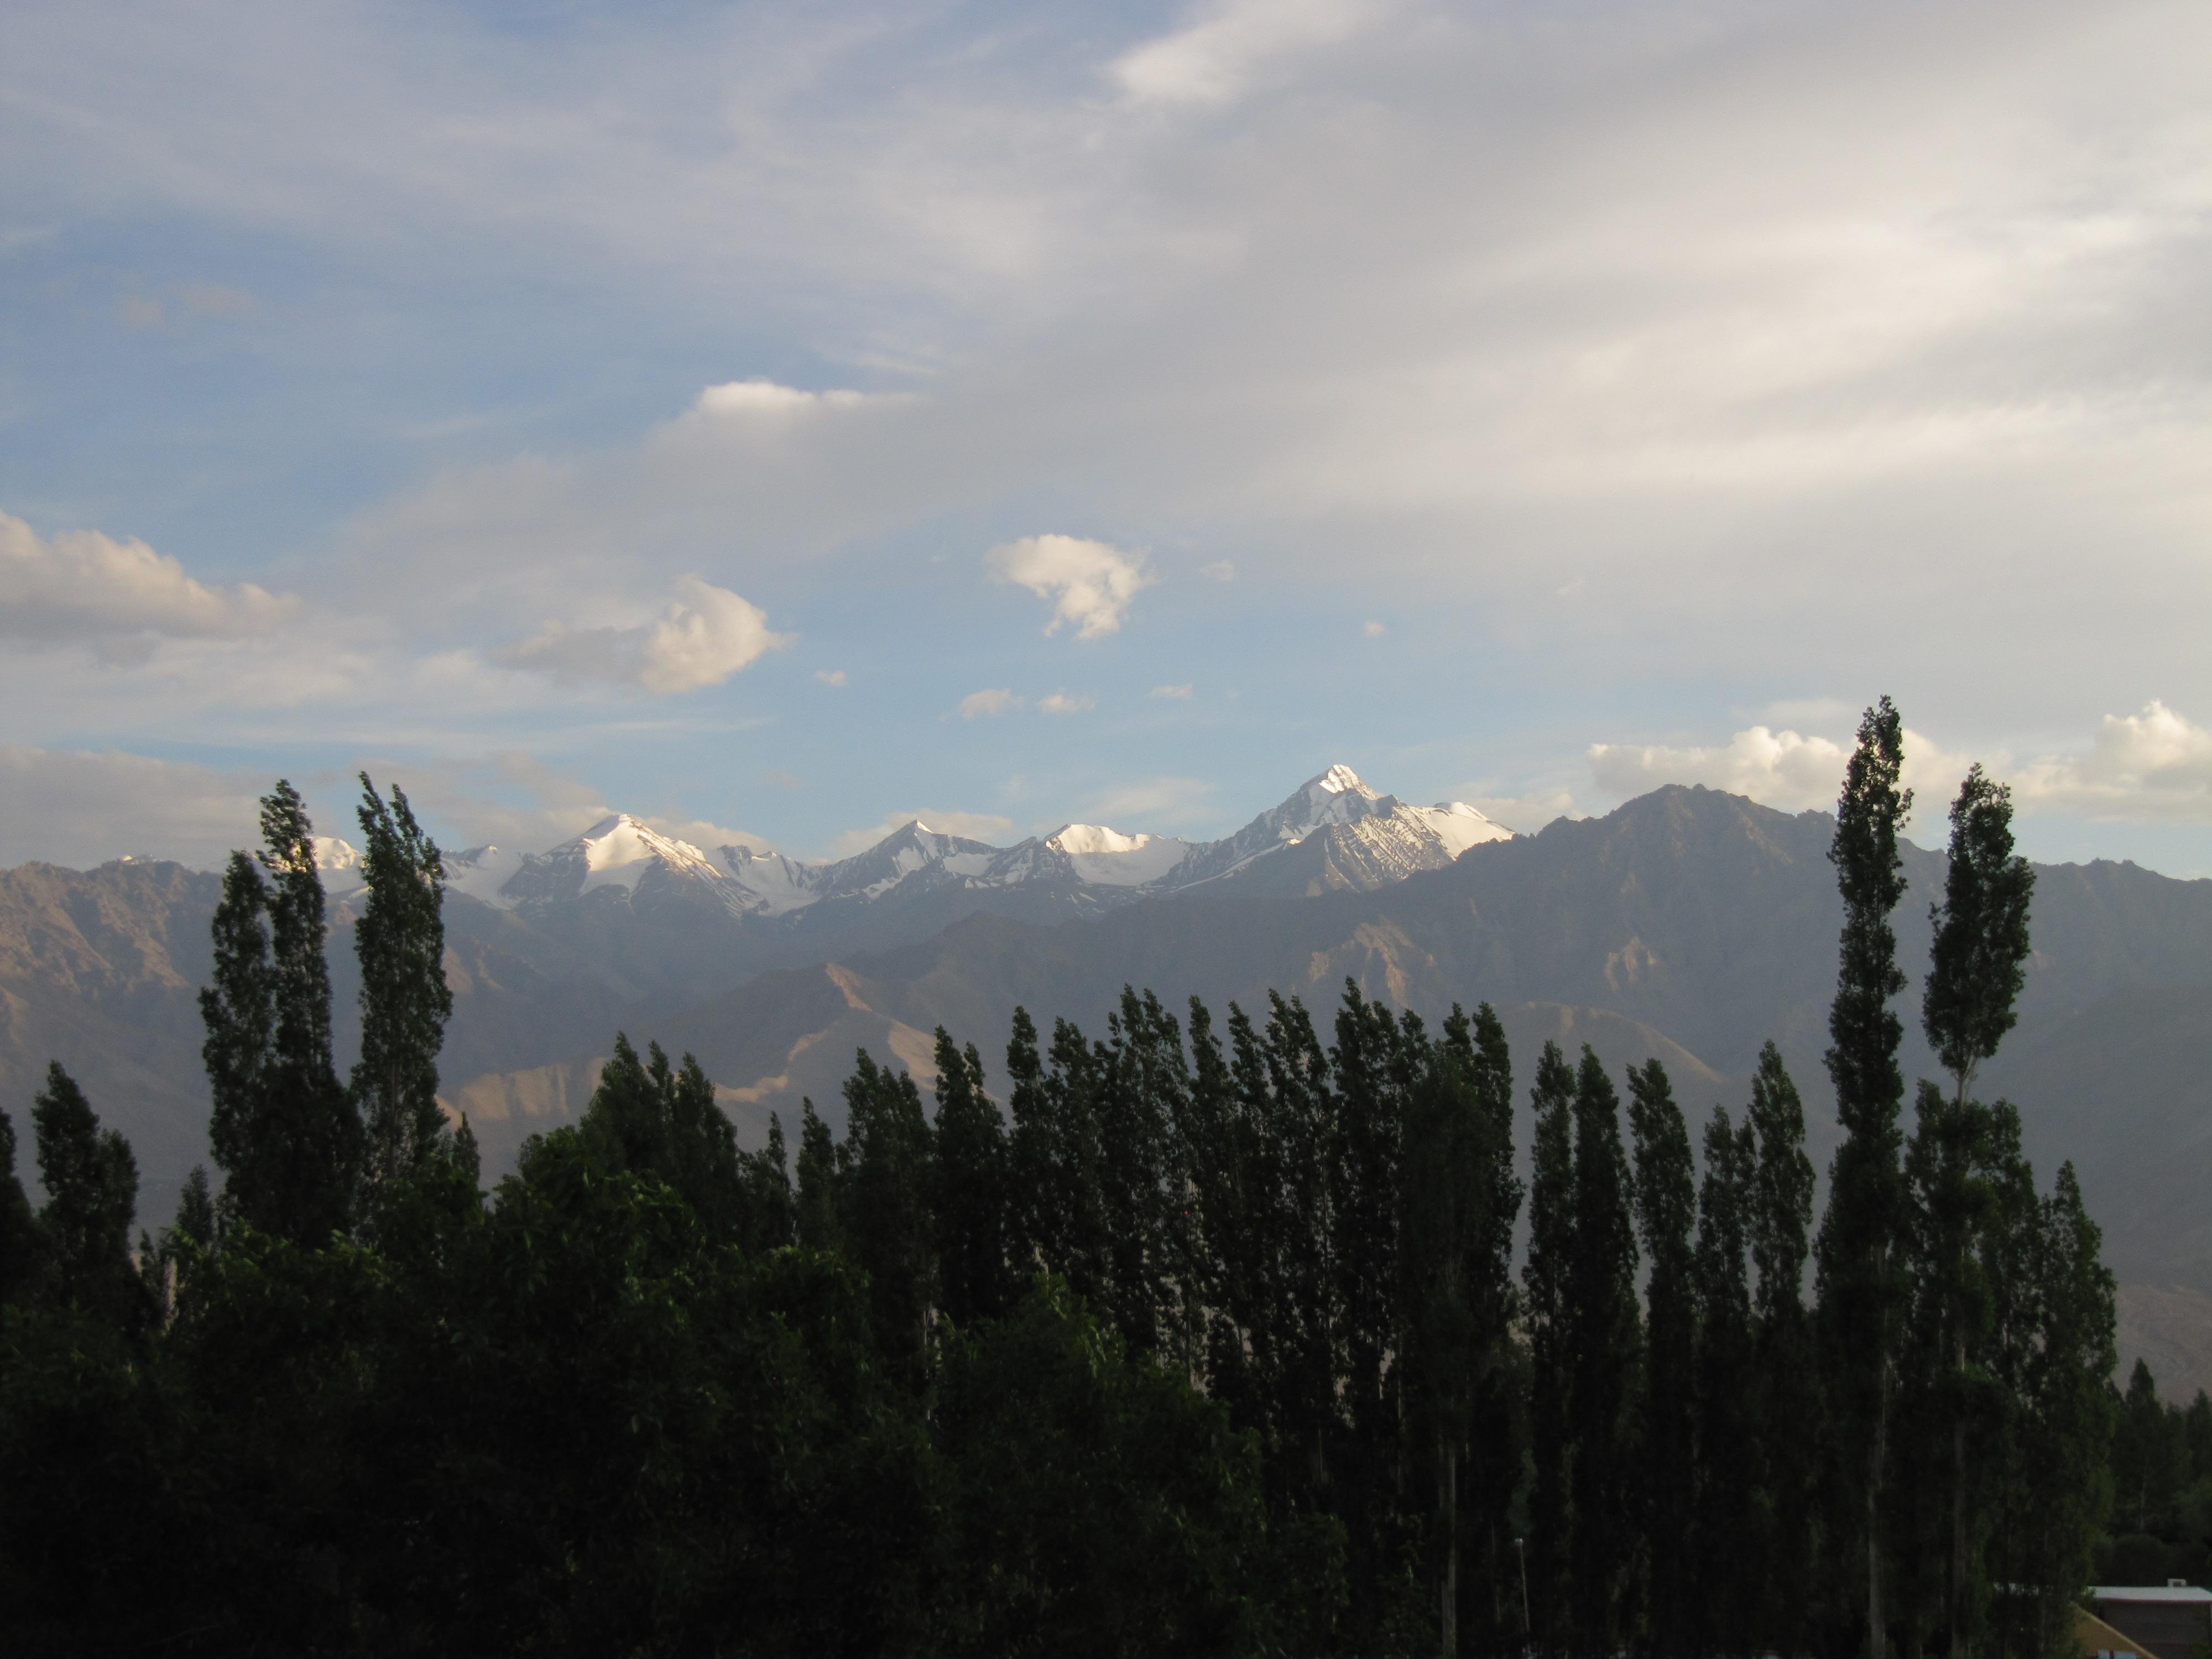 Snowline, Leh, Inde, 5 juillet 2013